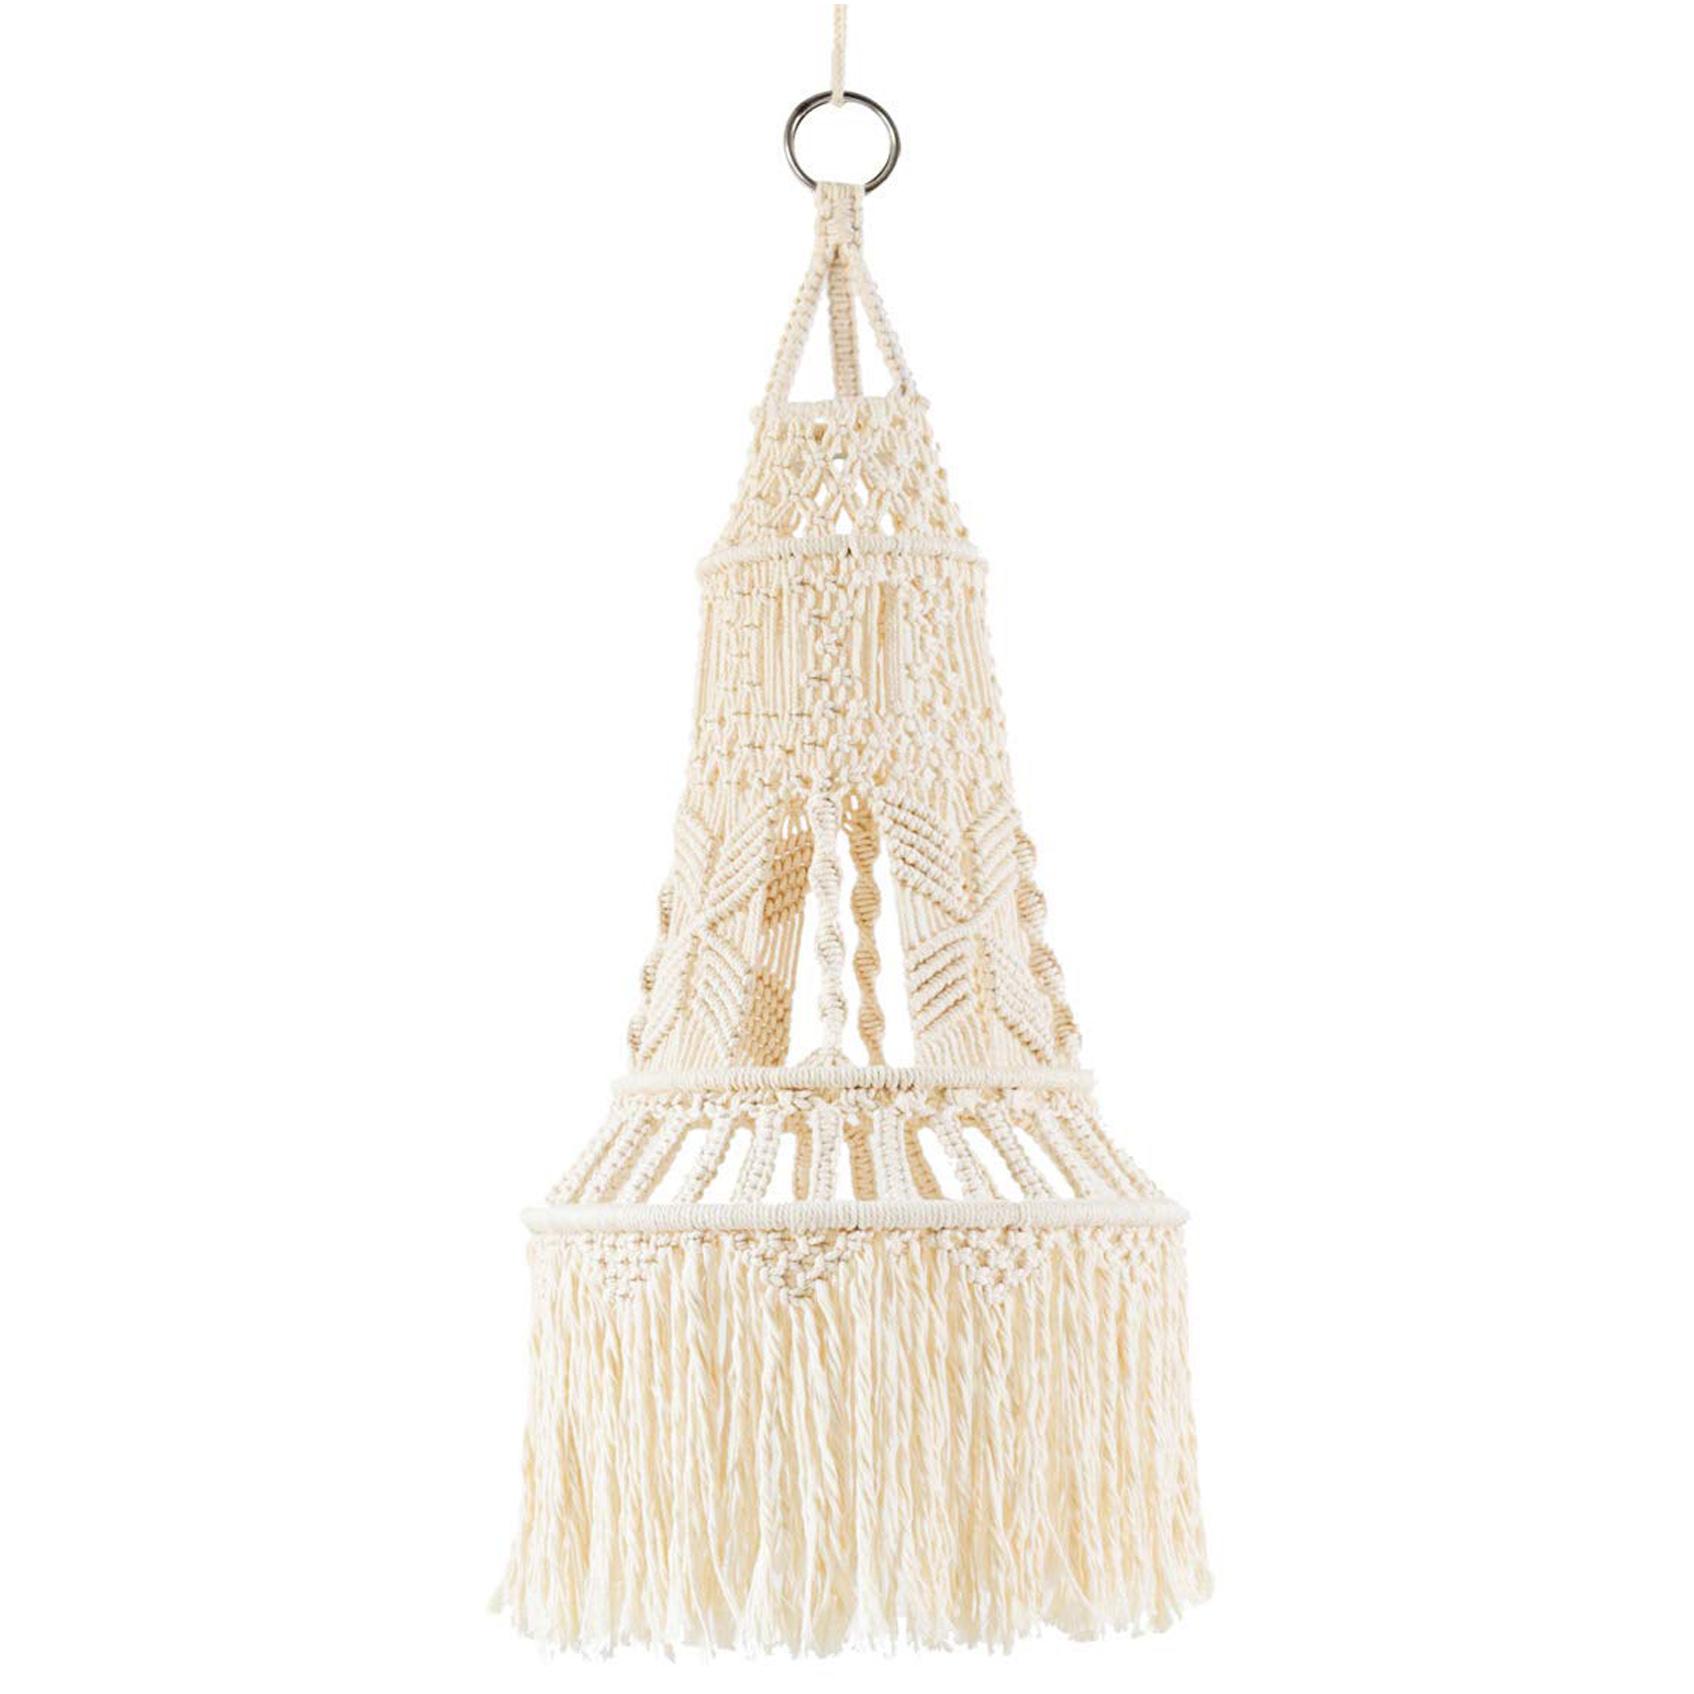 macrame chandelier light, boho-chic home decor